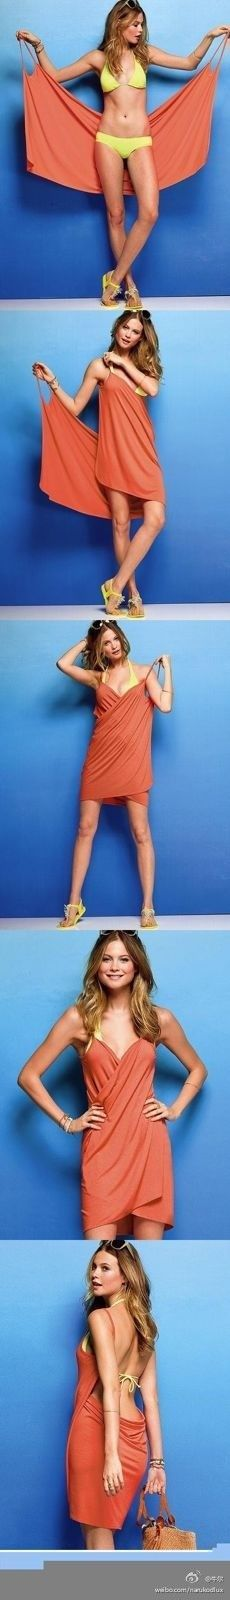 diy dress this looks simple